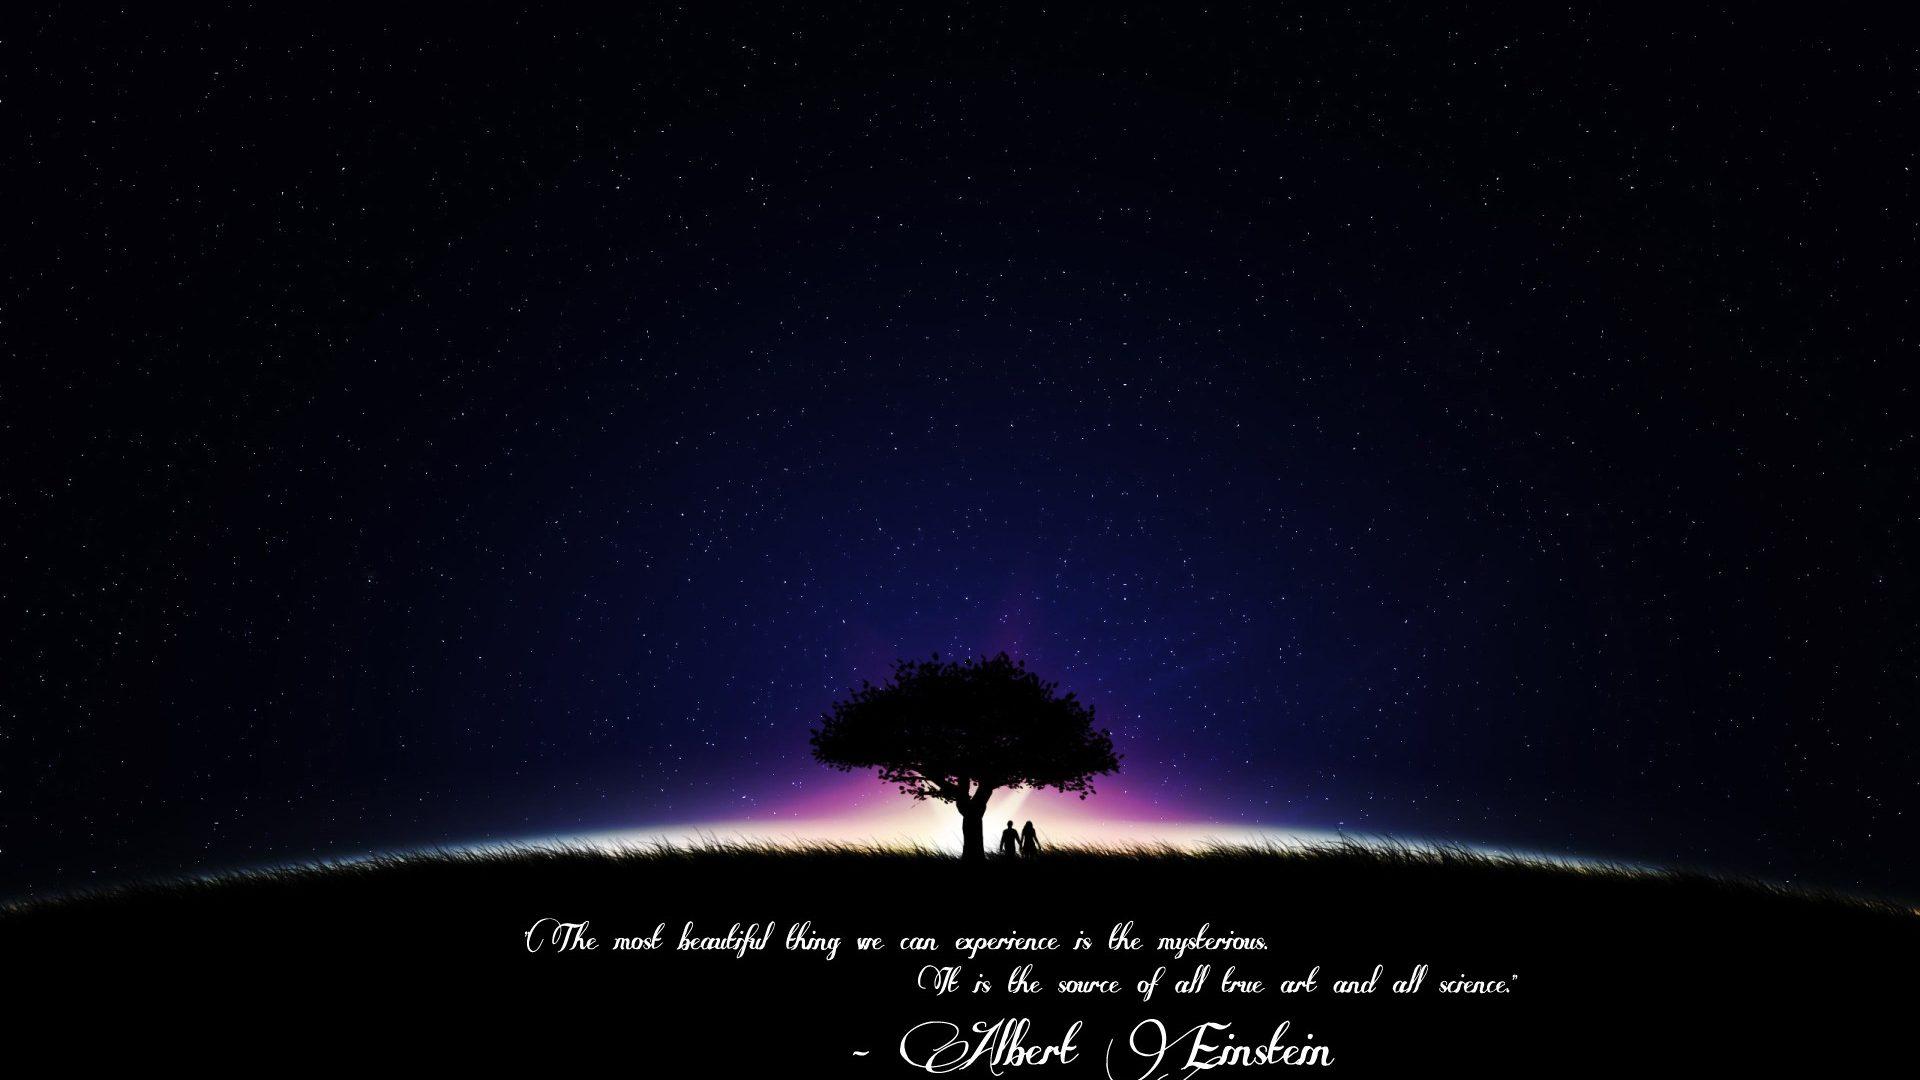 Drawn star sky full Albert Sky: Night 1920x1200 Einstein